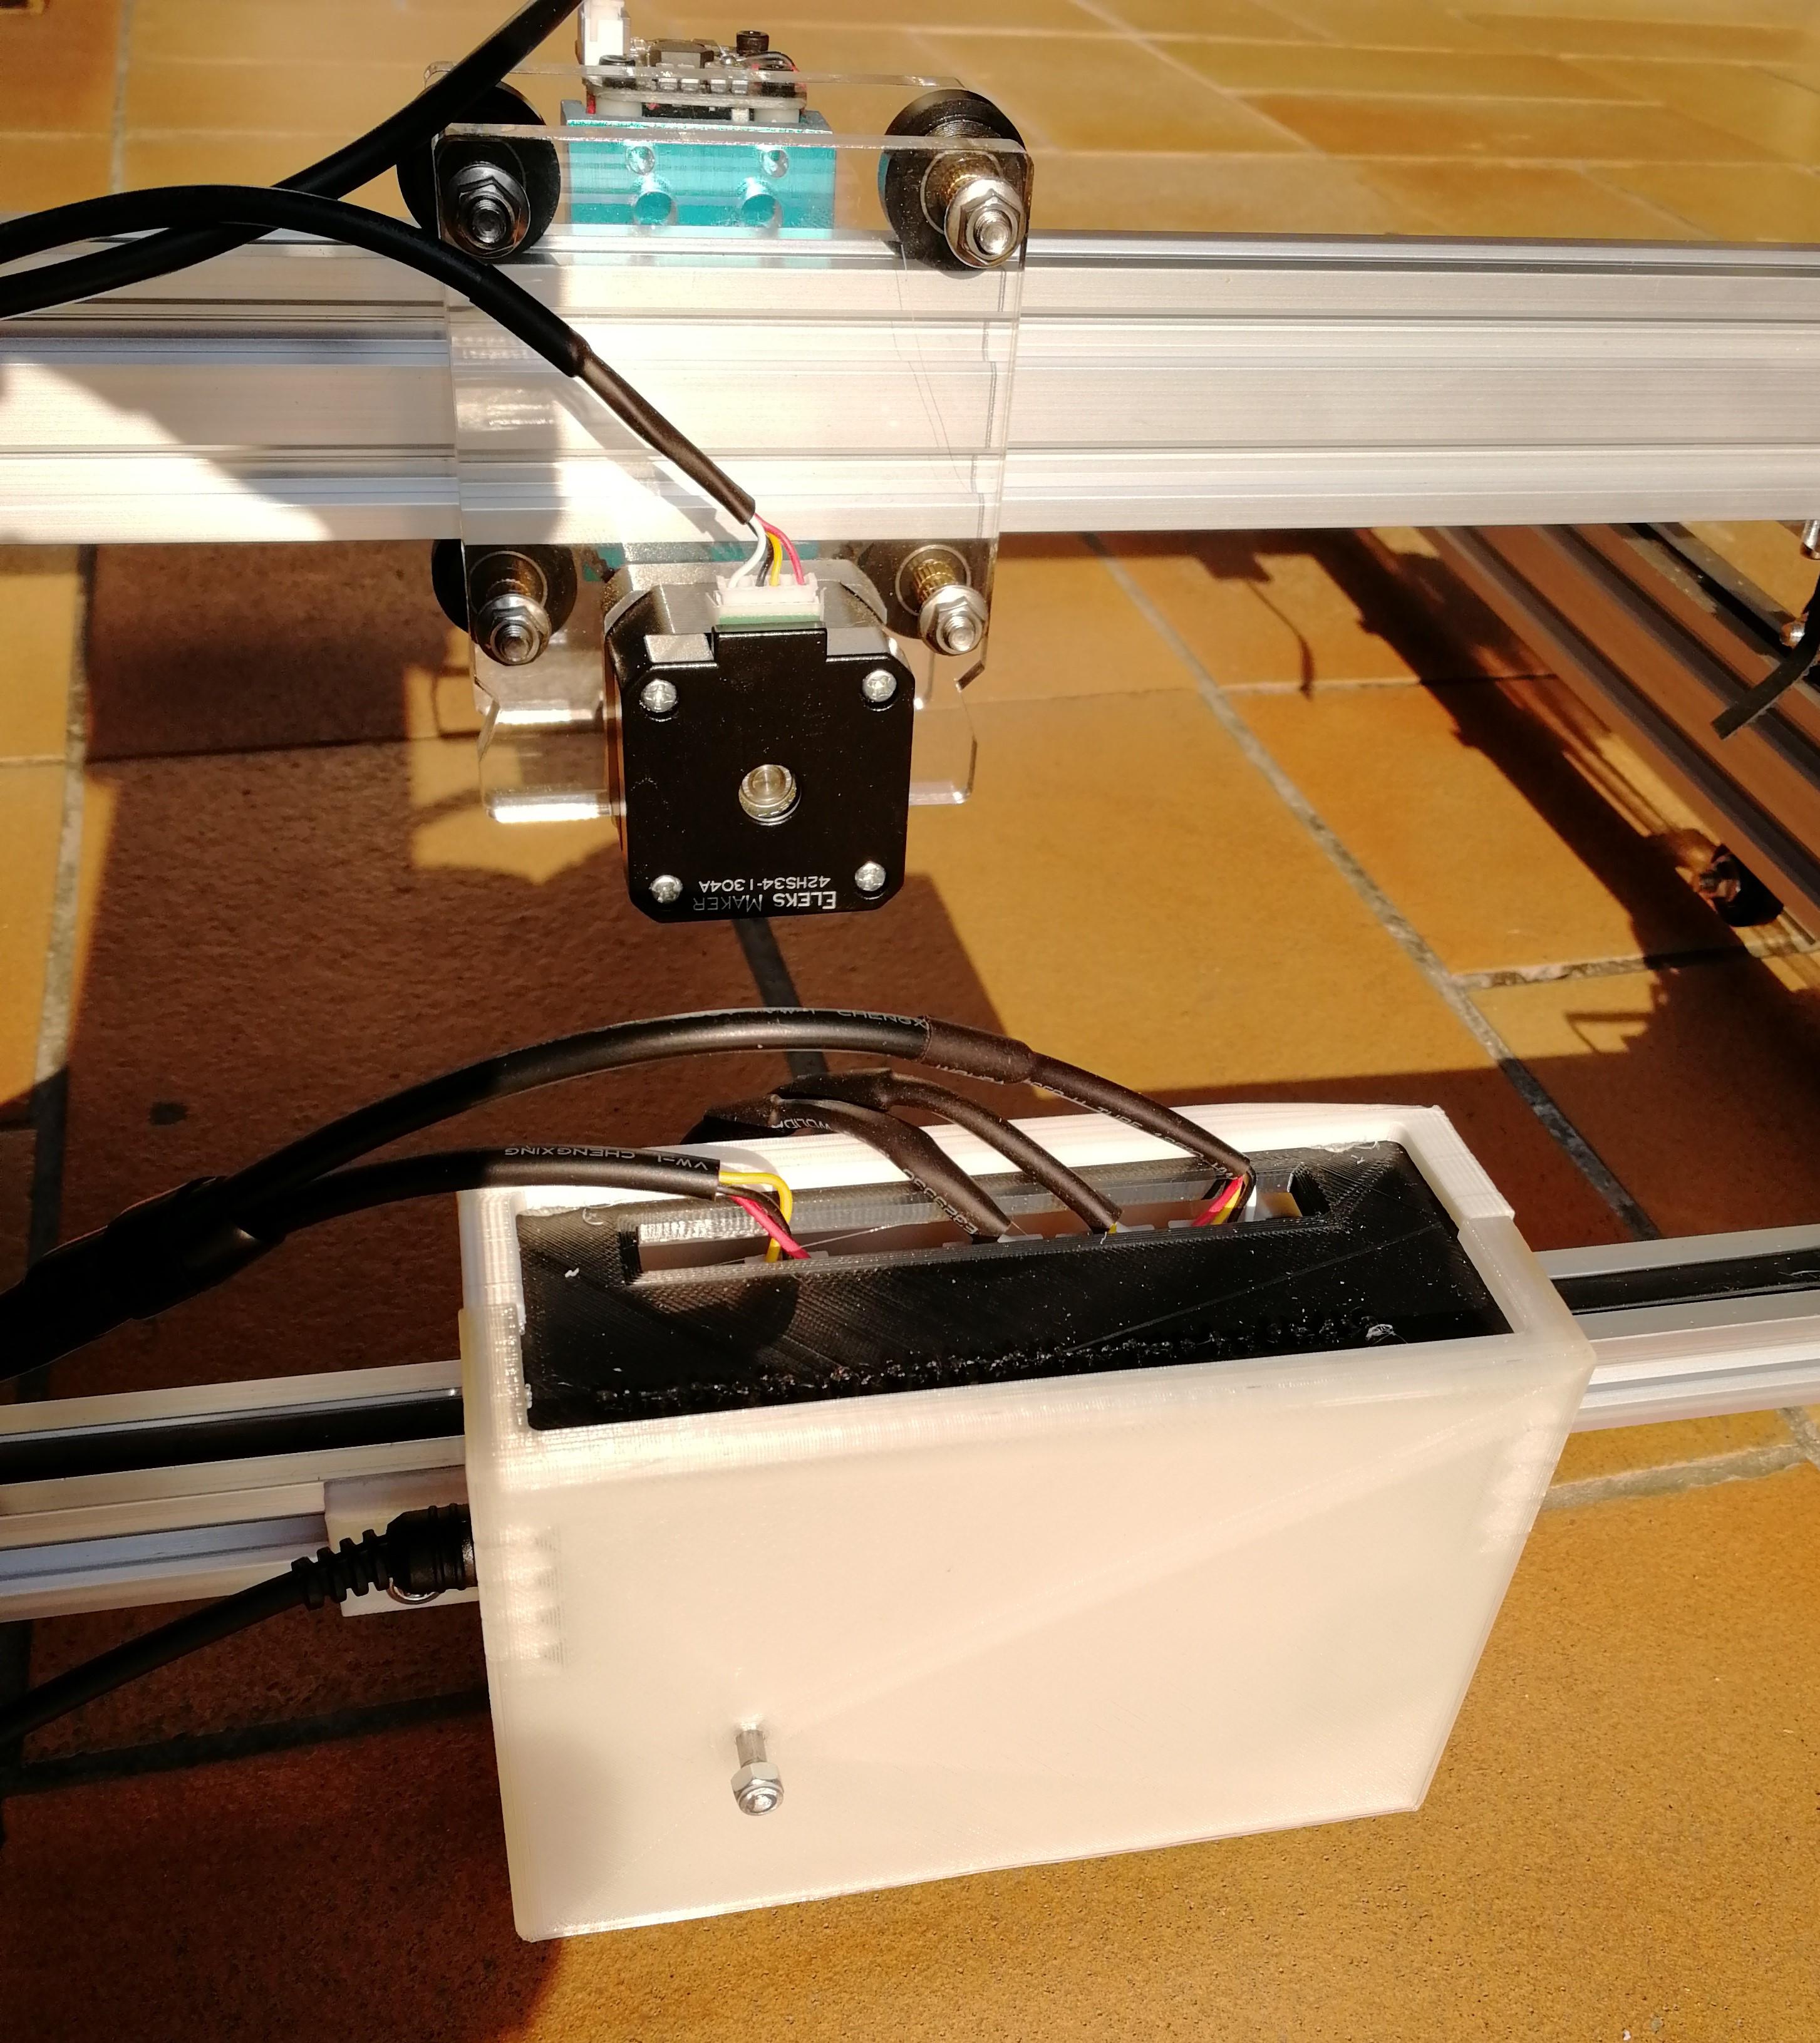 EleksMaker laser Bluetooth box by fbd38 - Thingiverse